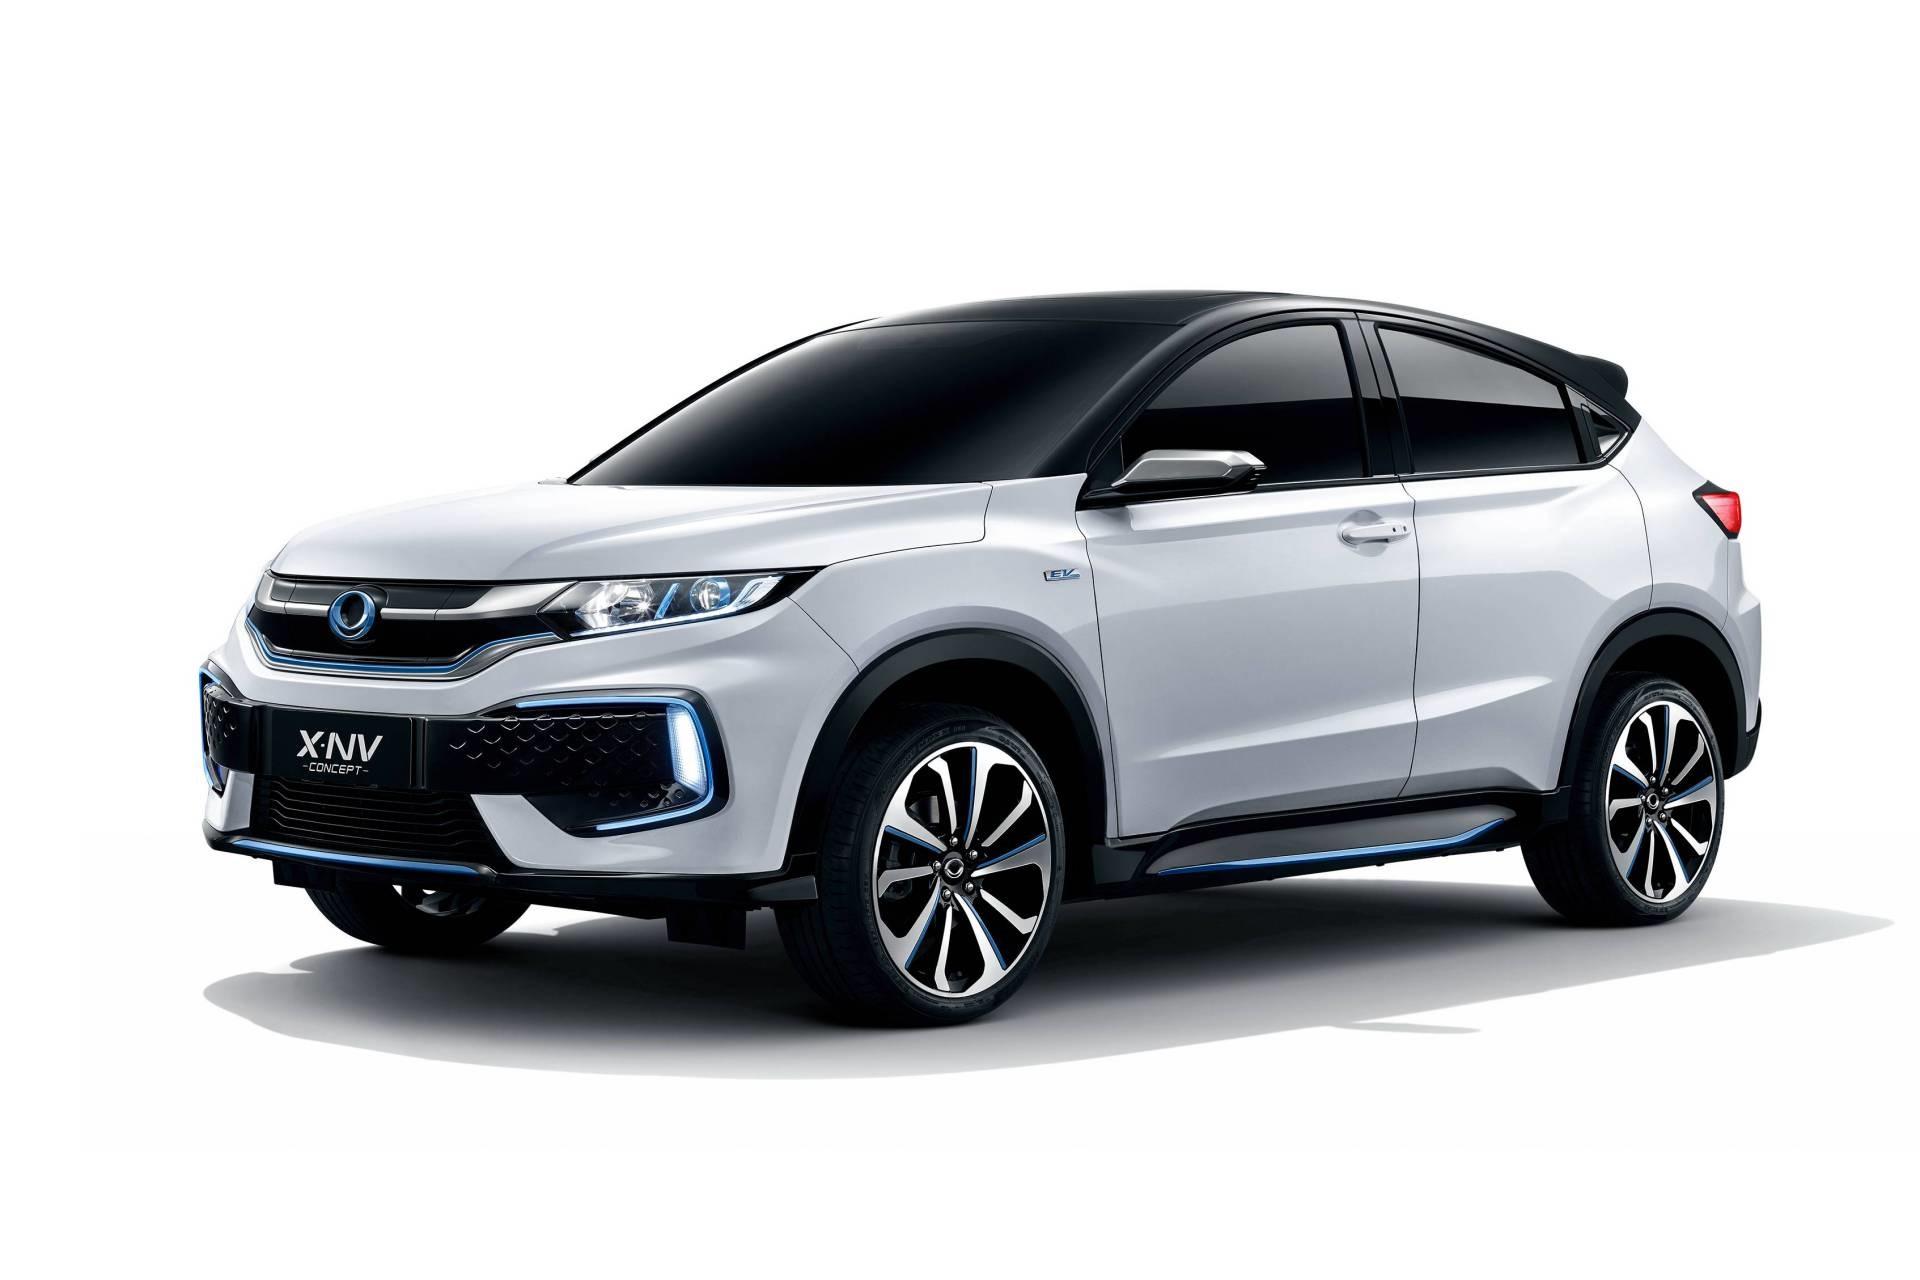 Honda-X-NV-Concept-1